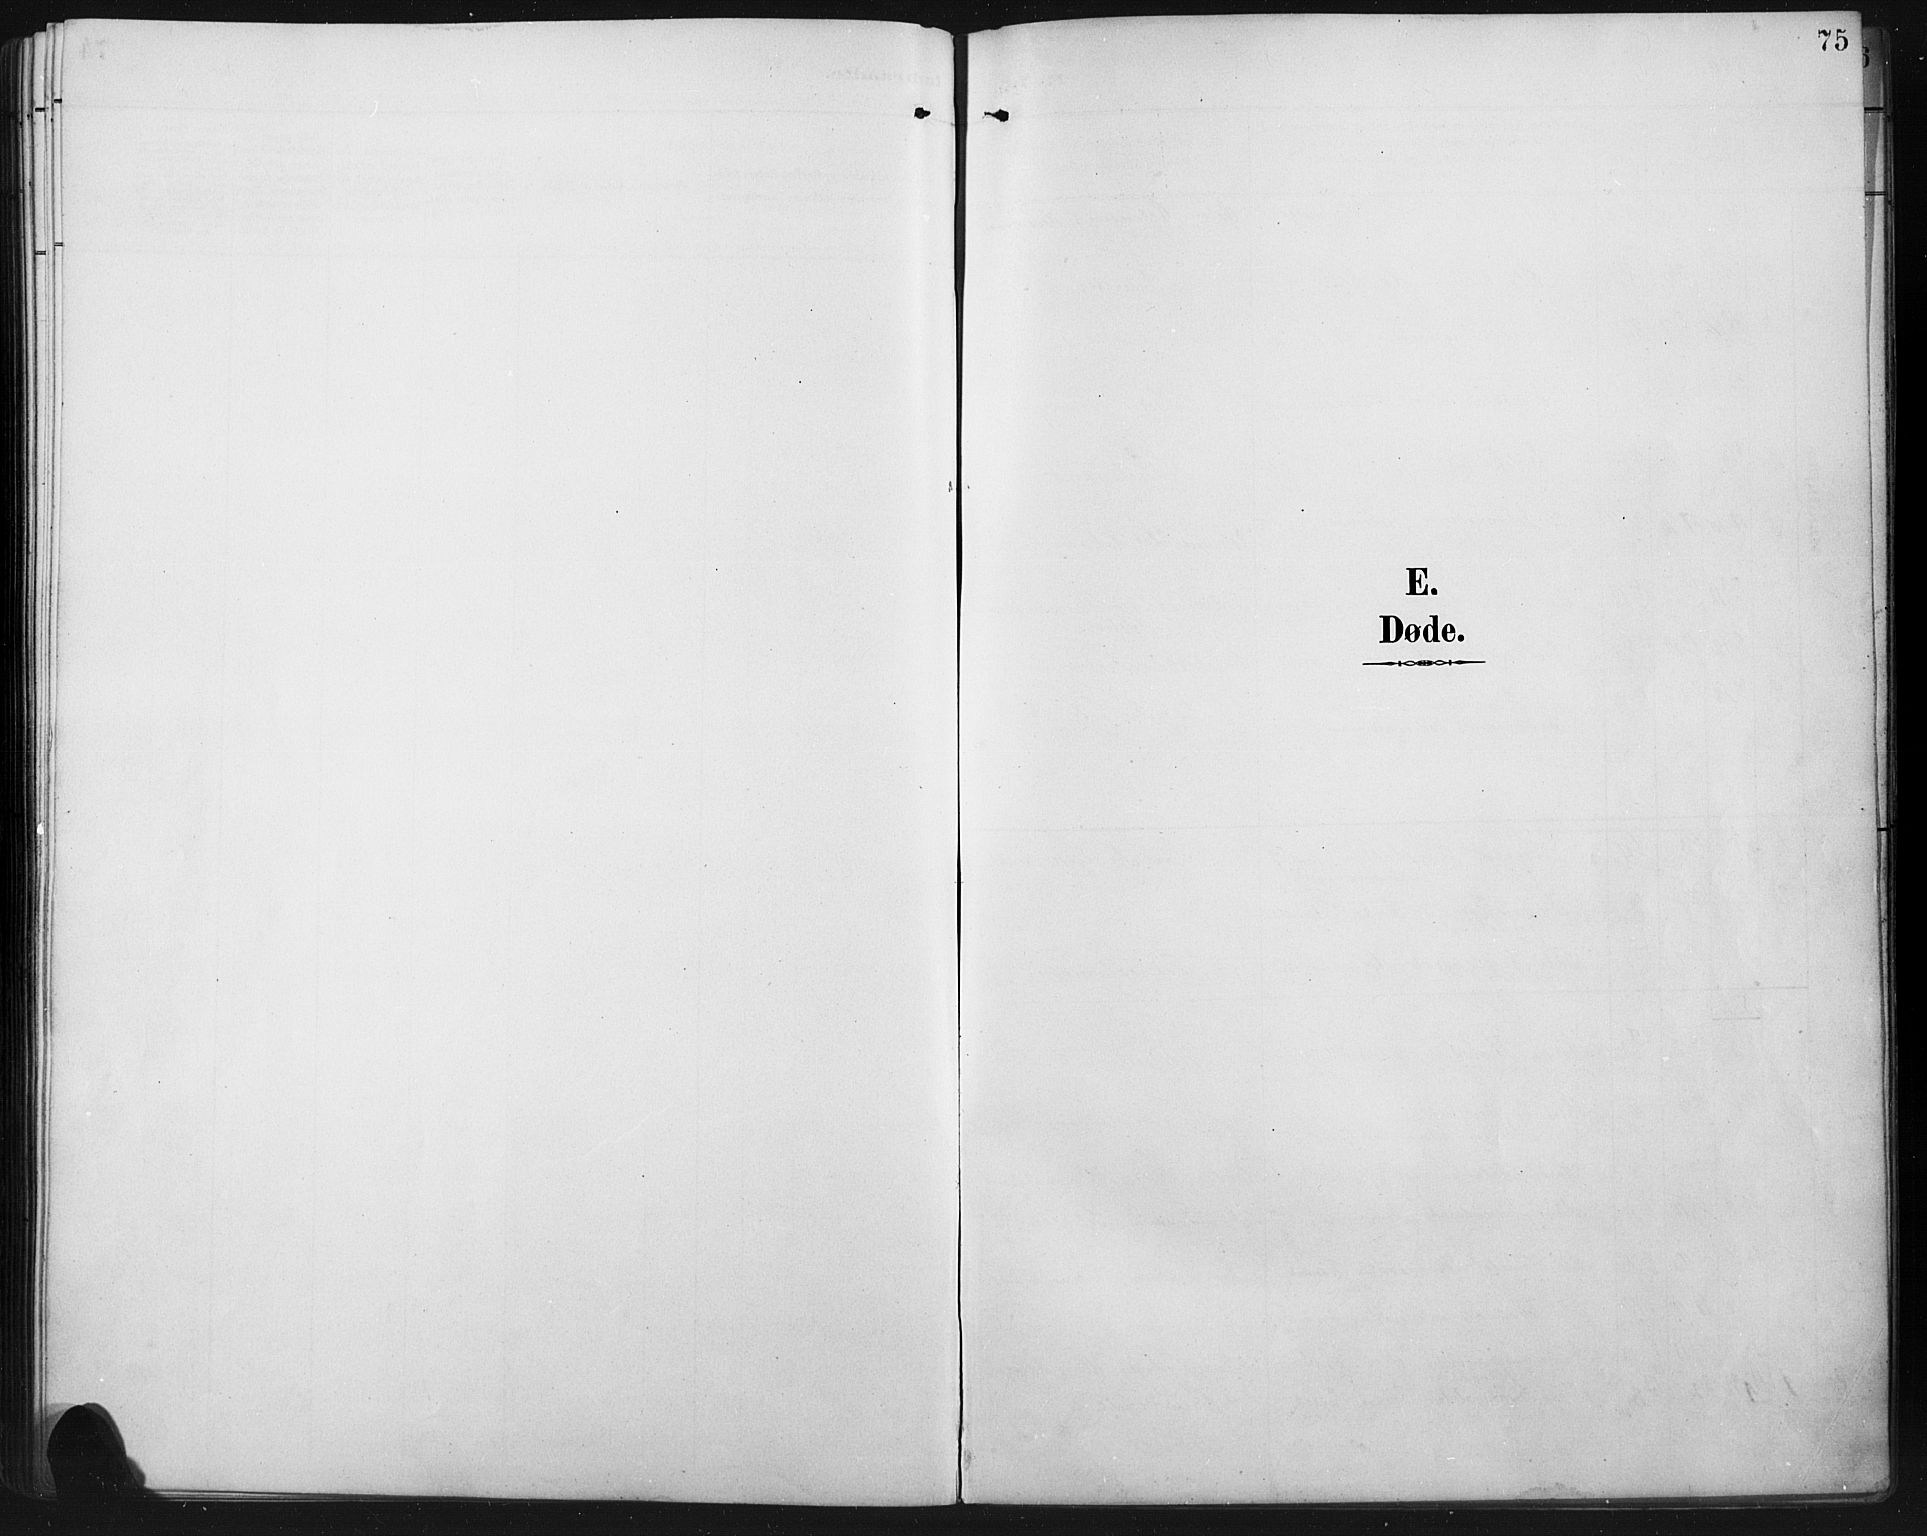 SAH, Ringebu prestekontor, Klokkerbok nr. 8, 1890-1922, s. 75